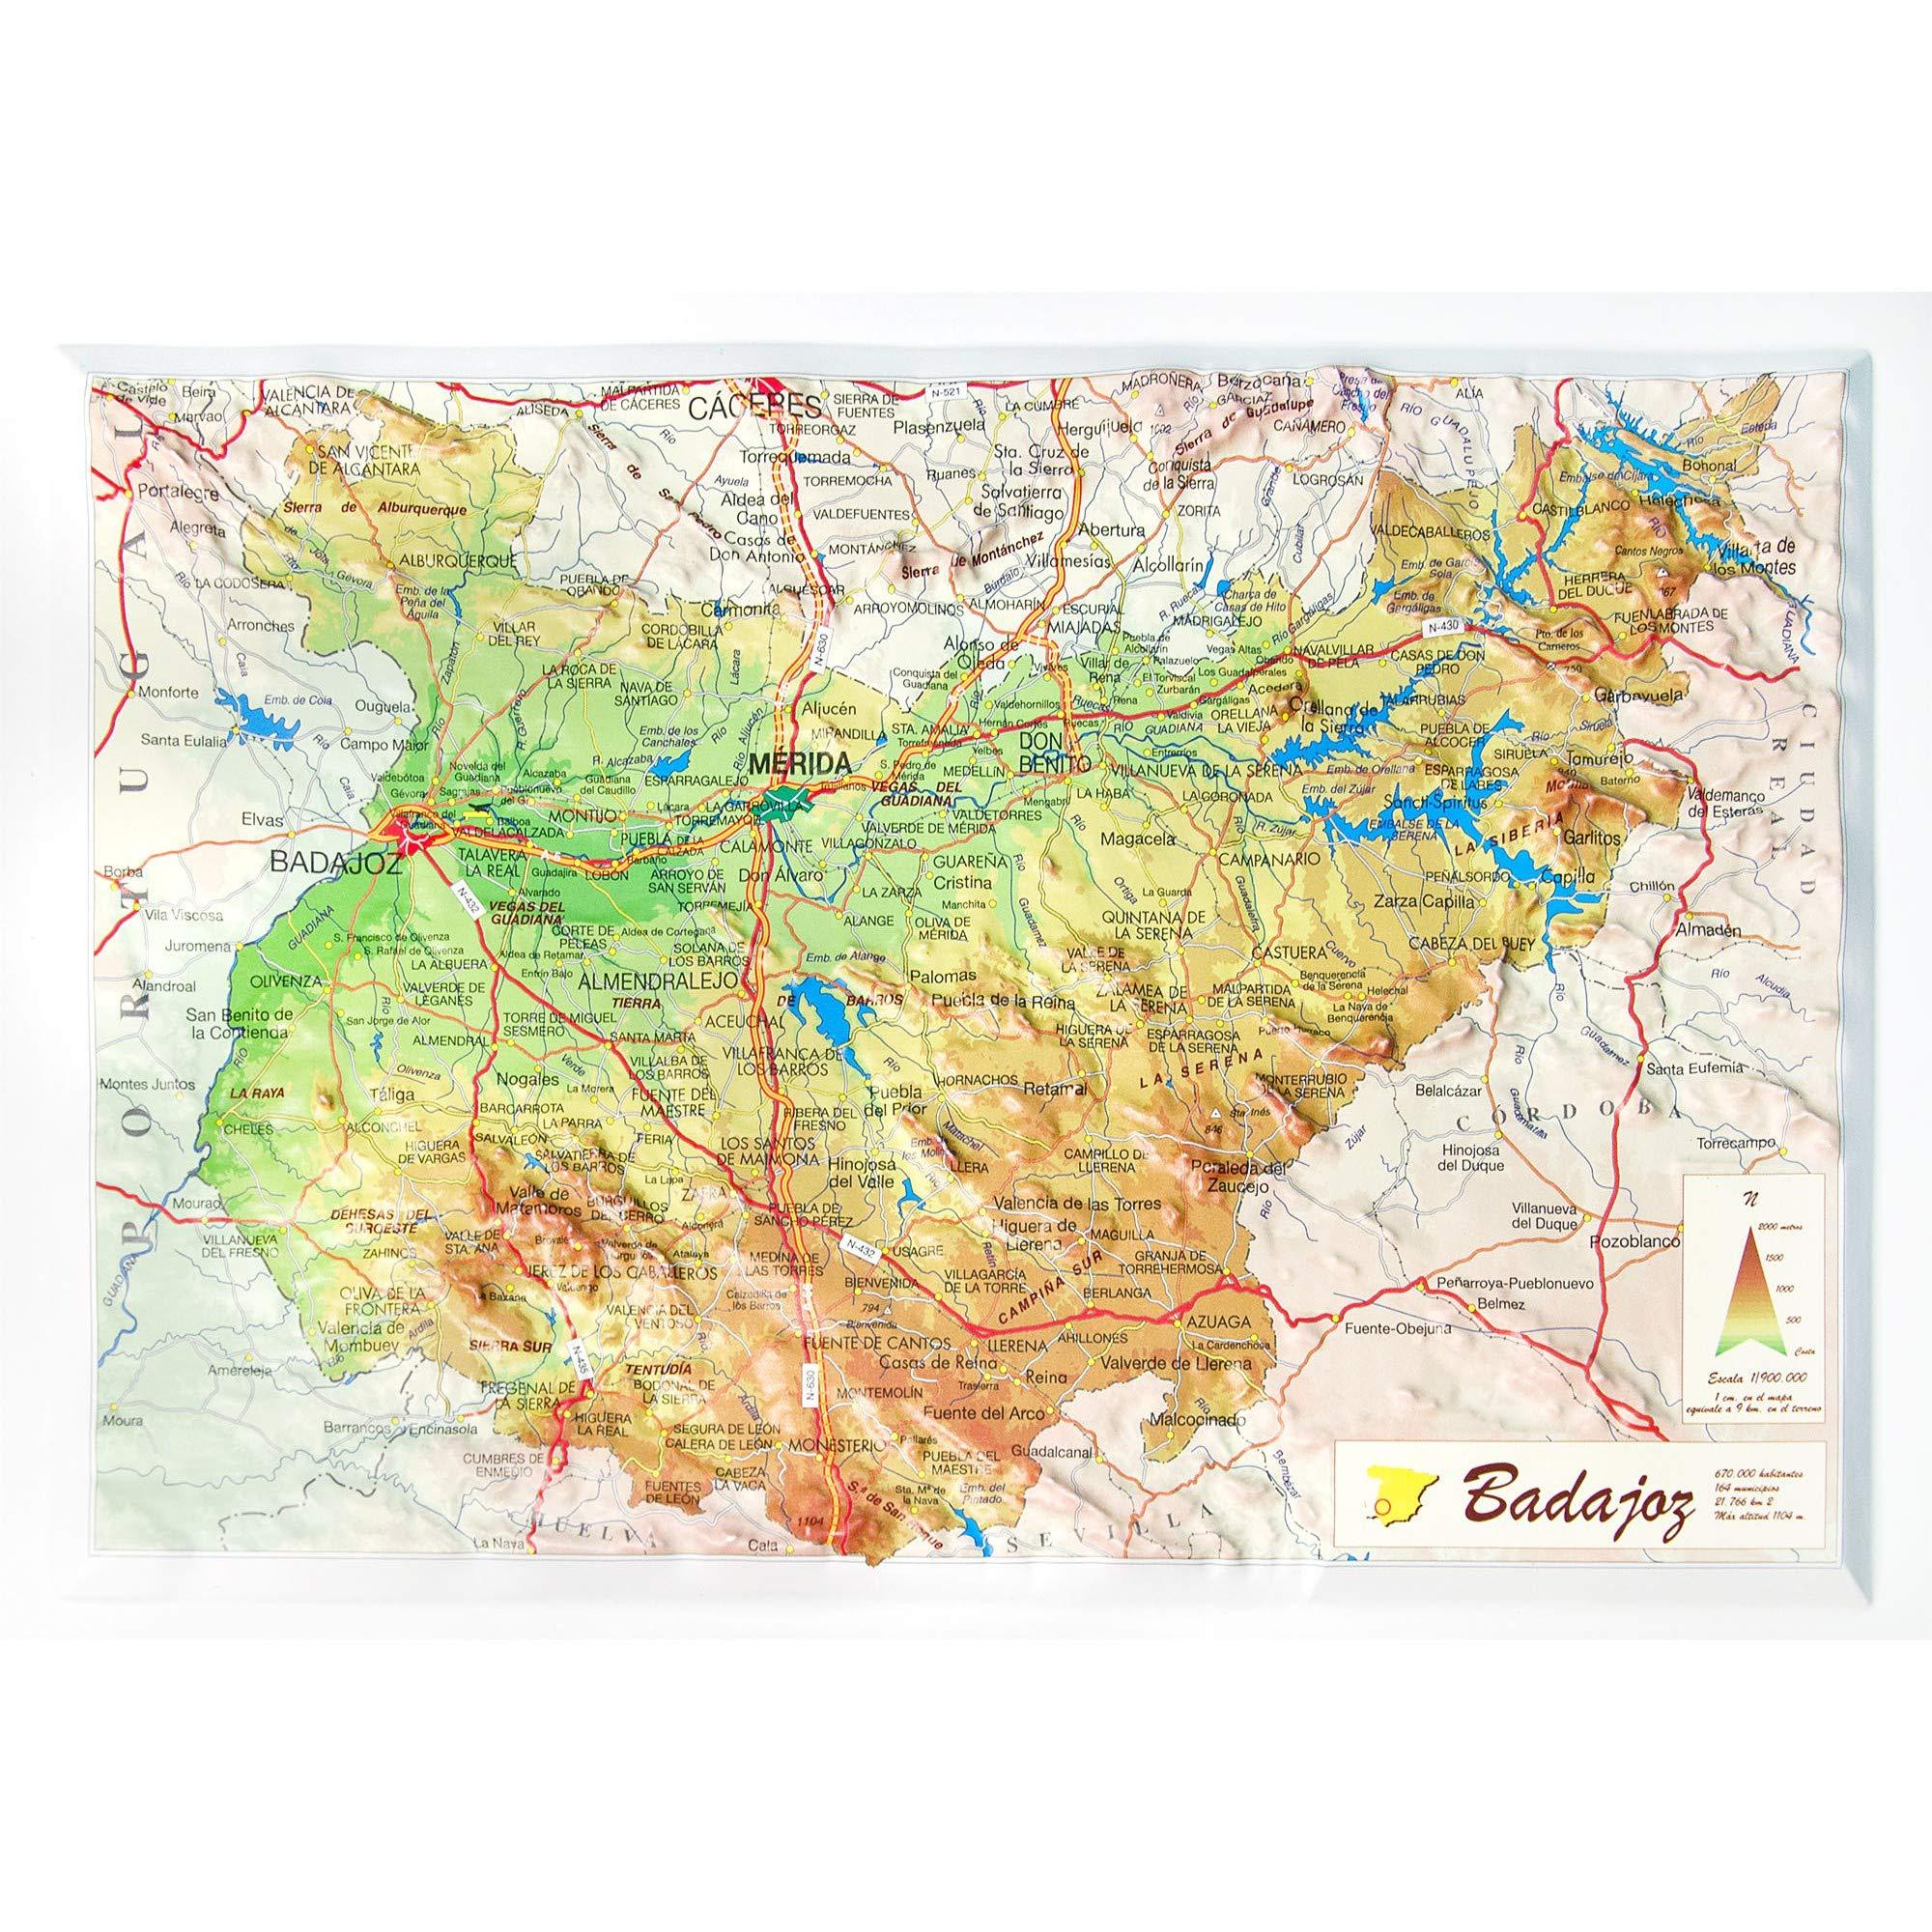 Mapa De Badajoz Capital.Mapa En Relieve De Badajoz Escala 1 900 000 Amazon Es All 3d Form S L Libros